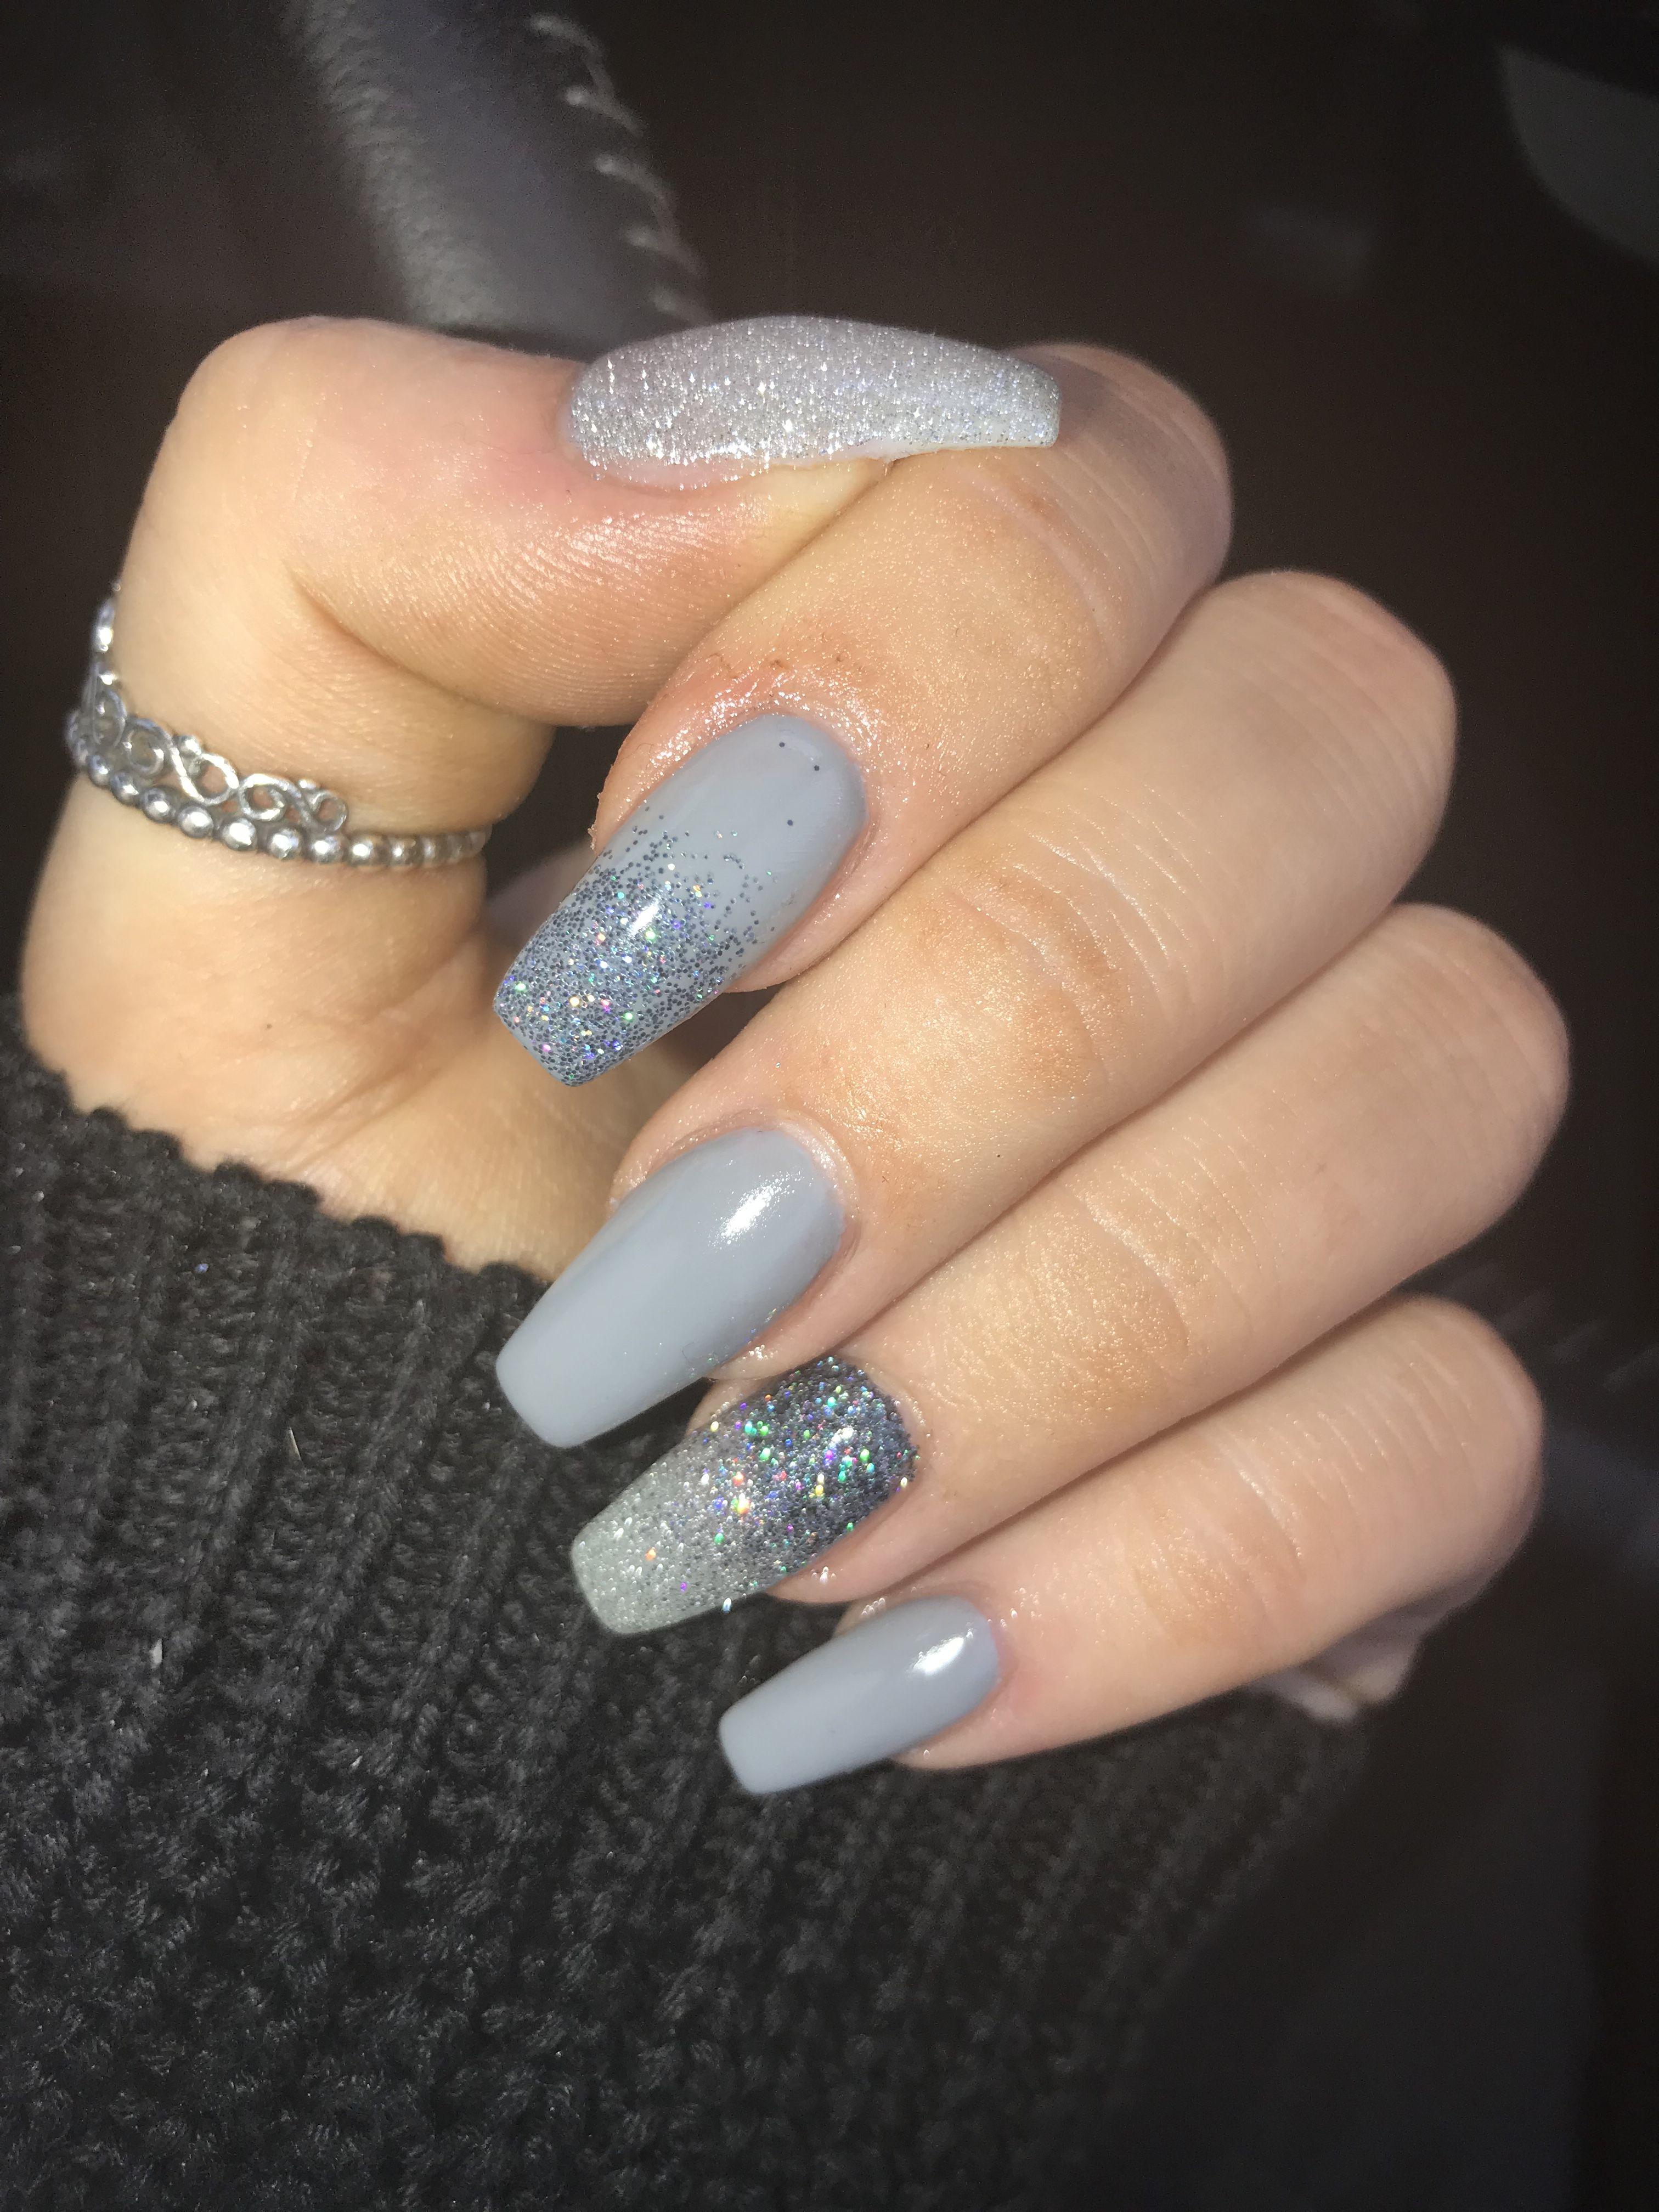 Grey Acrylic Glitter Nails Glitter Nails Acrylic Pink Acrylic Nails Gel Nails